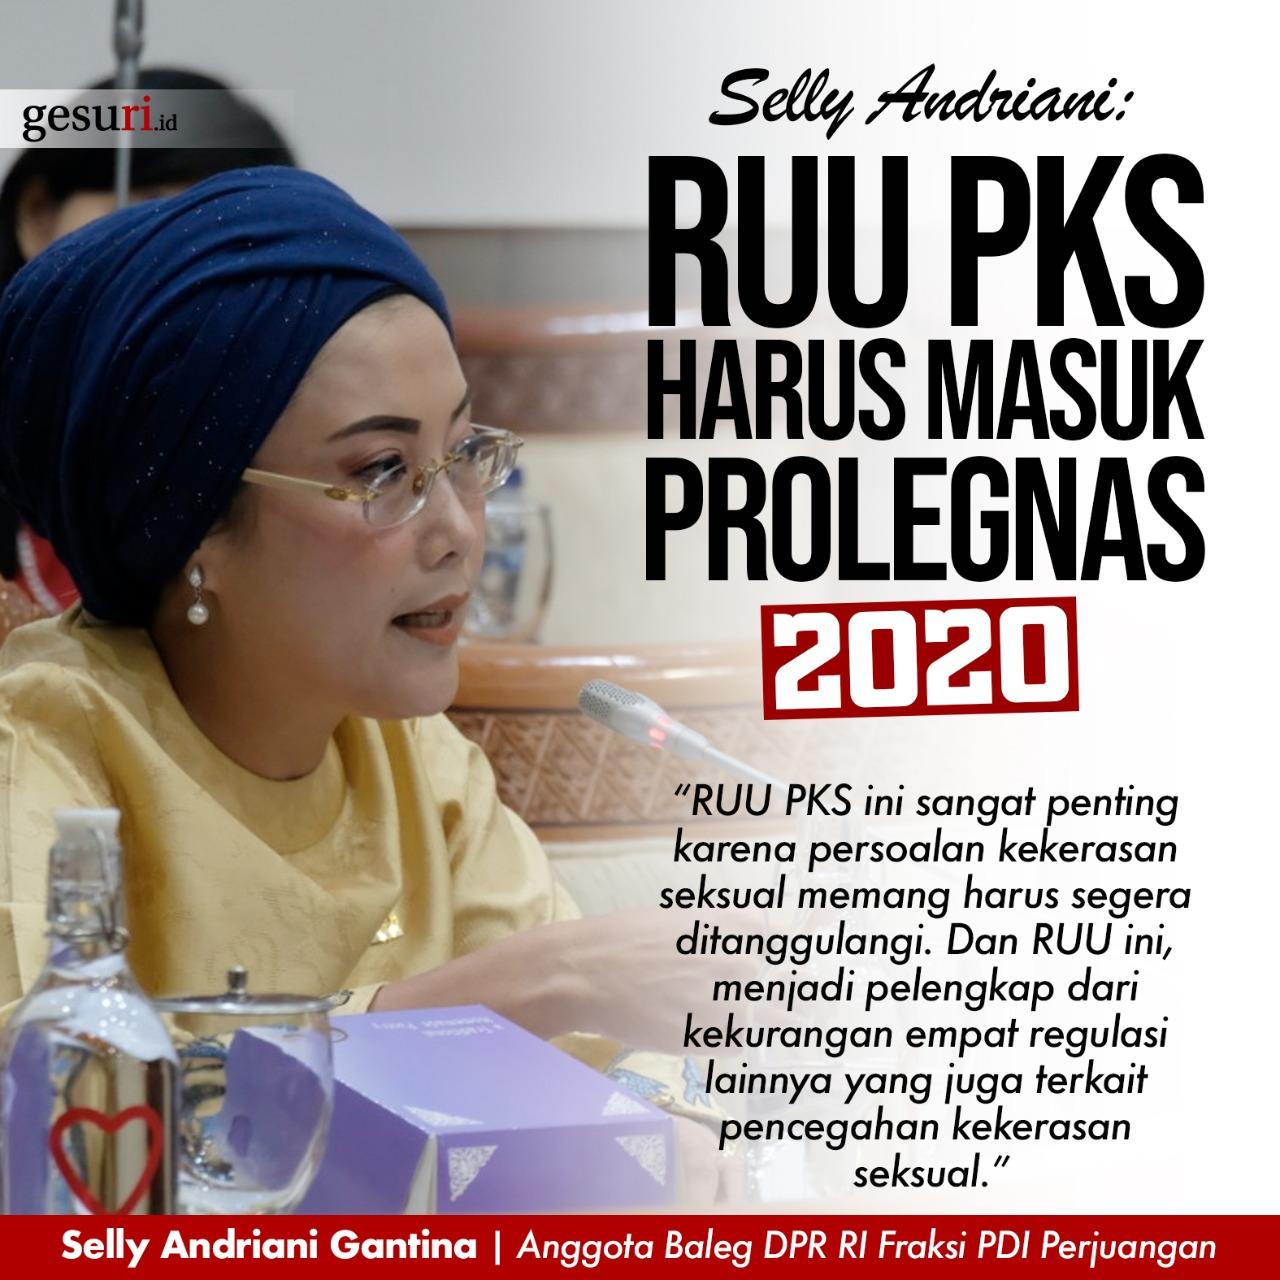 Selly Minta RUU PKS Harus Masuk Prolegnas 2020